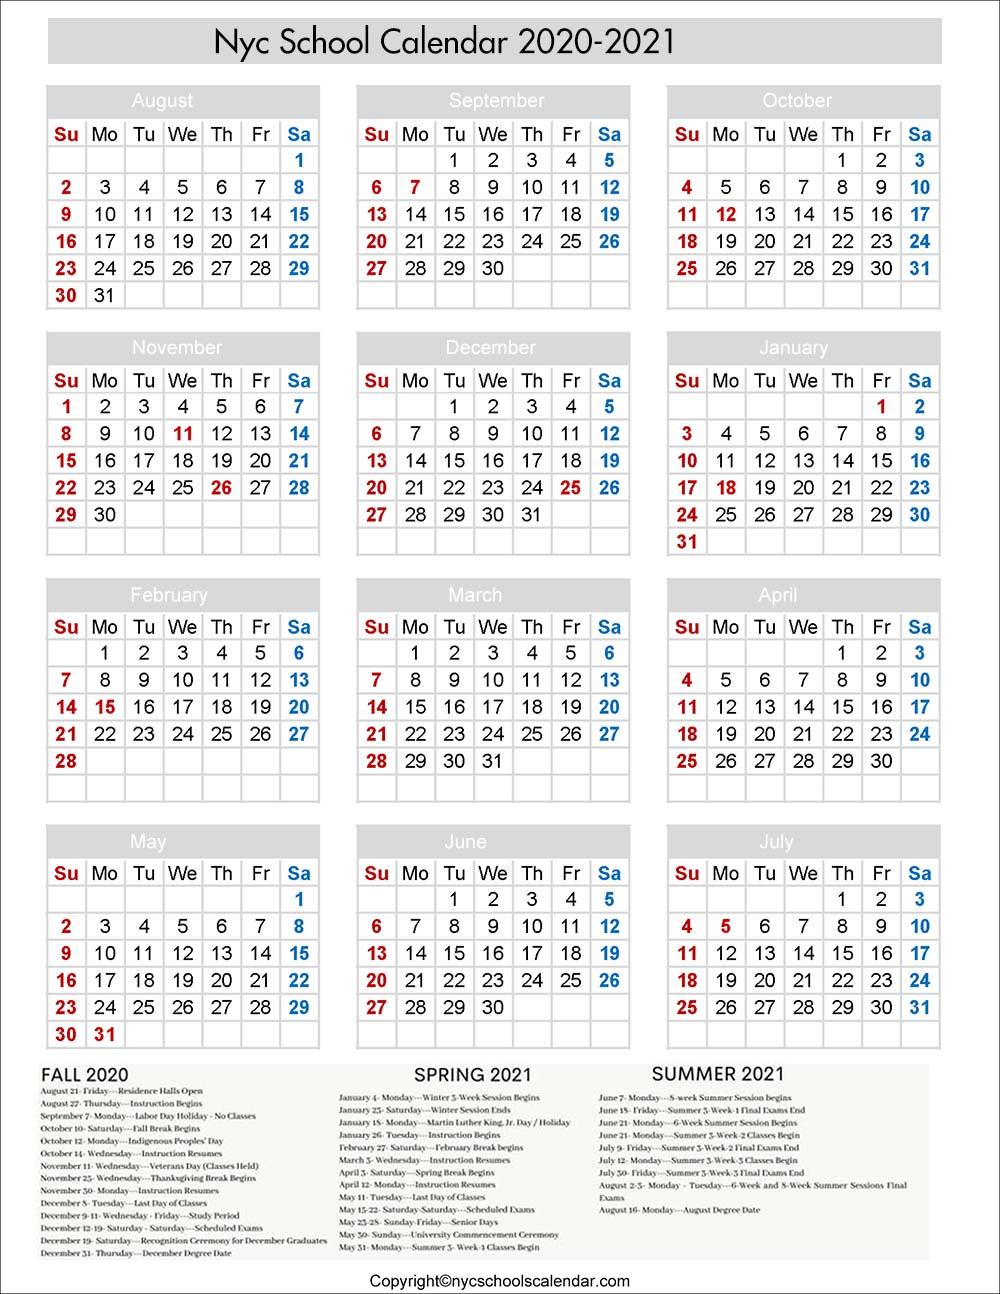 NYC School Holiday 2020